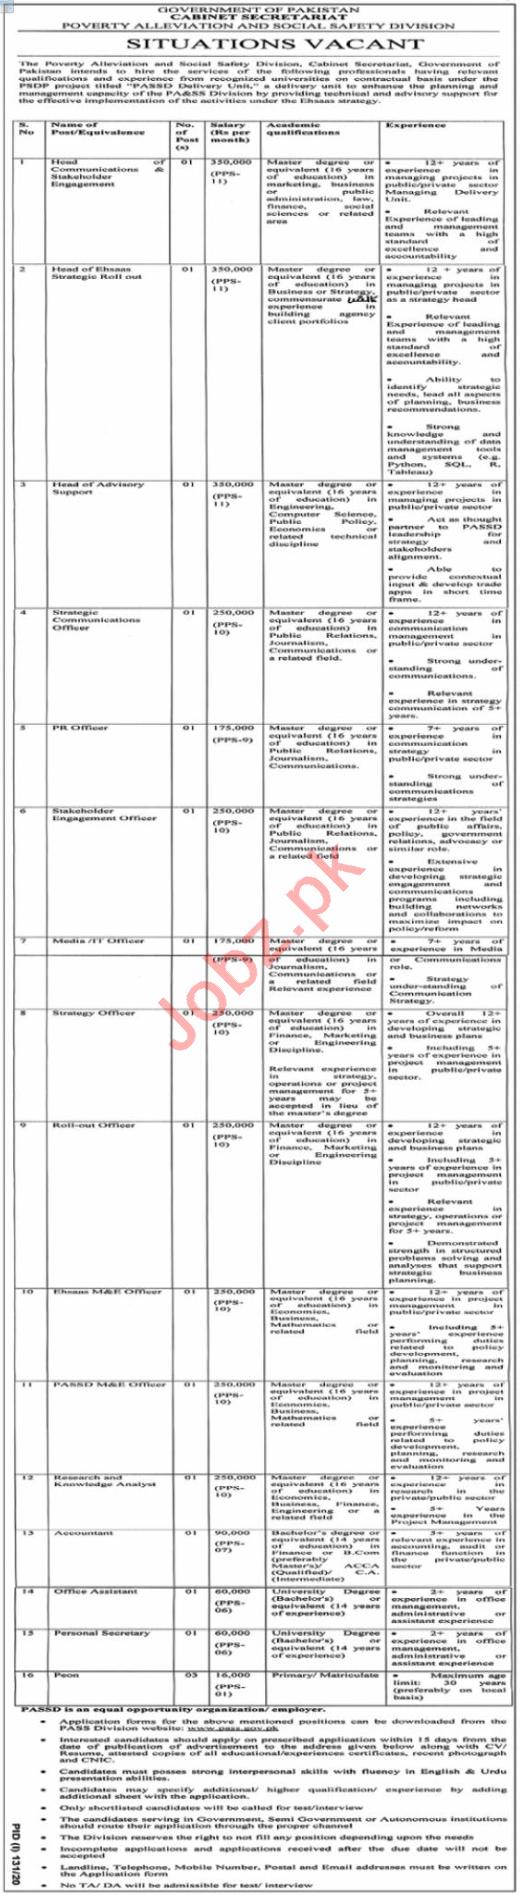 Prime Ministers Office PMO Cabinet Secretariat Jobs 2020